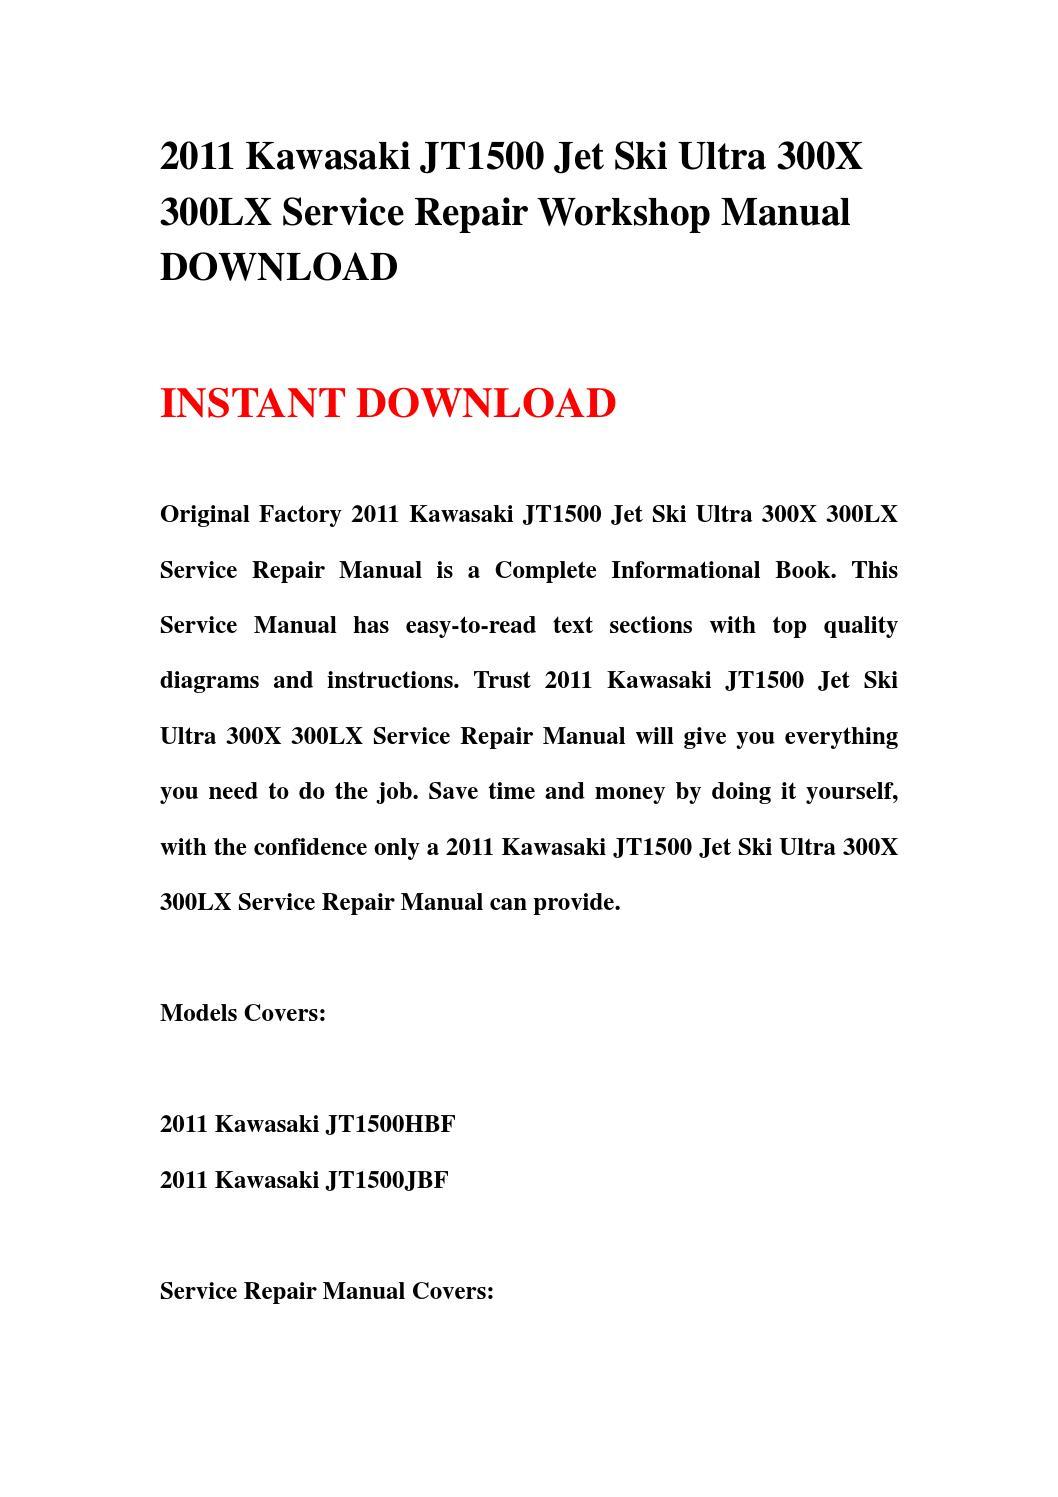 2013 kawasaki ninja 300 service manual pdf